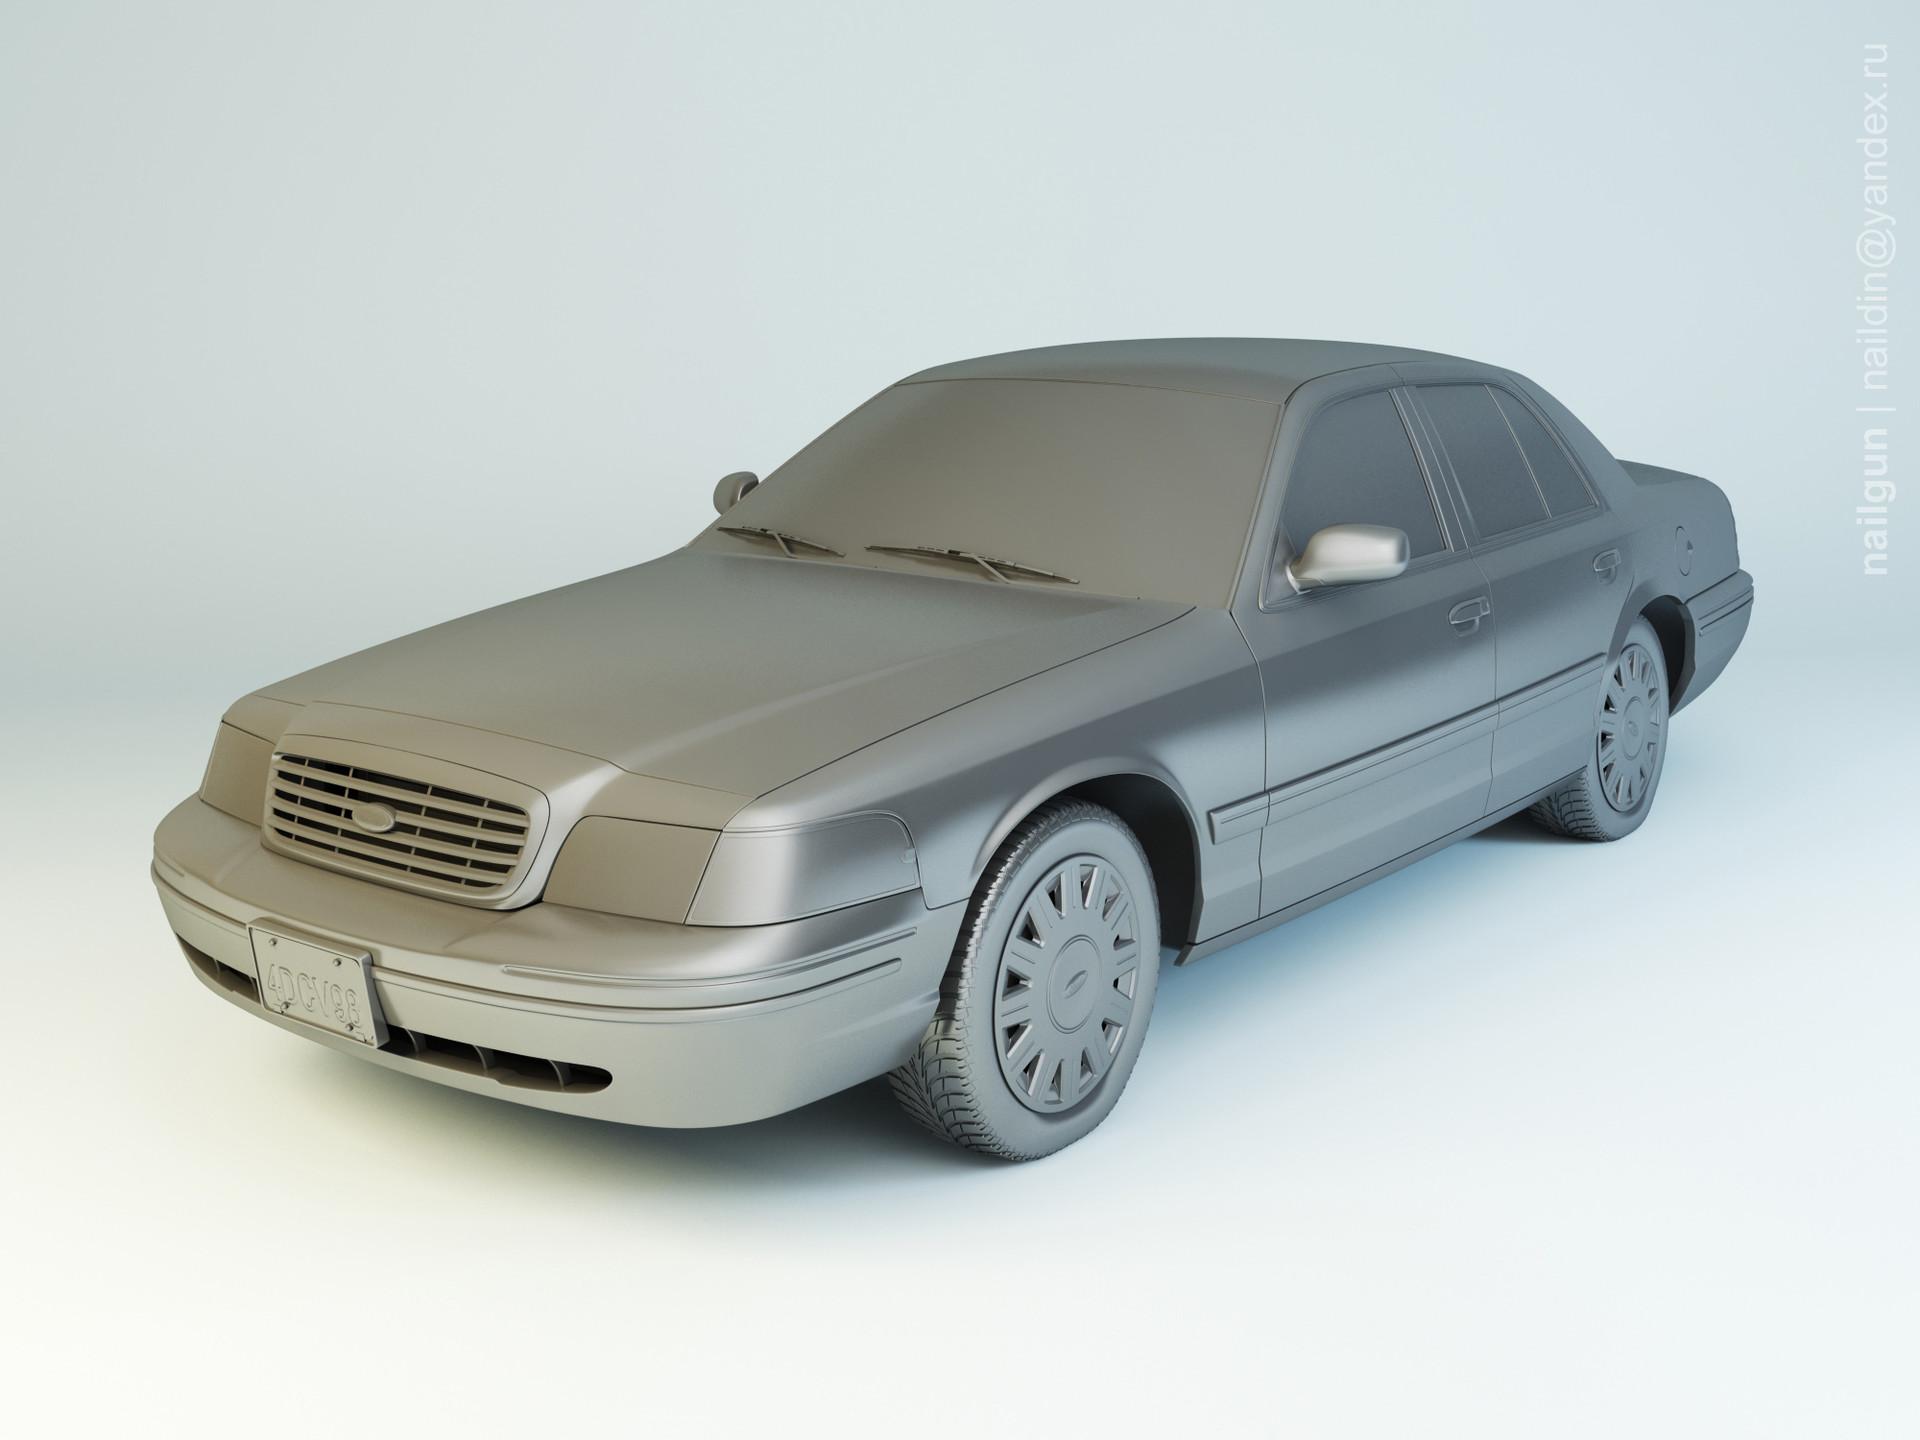 Nail khusnutdinov pwc 036 000 ford cv modelling 0